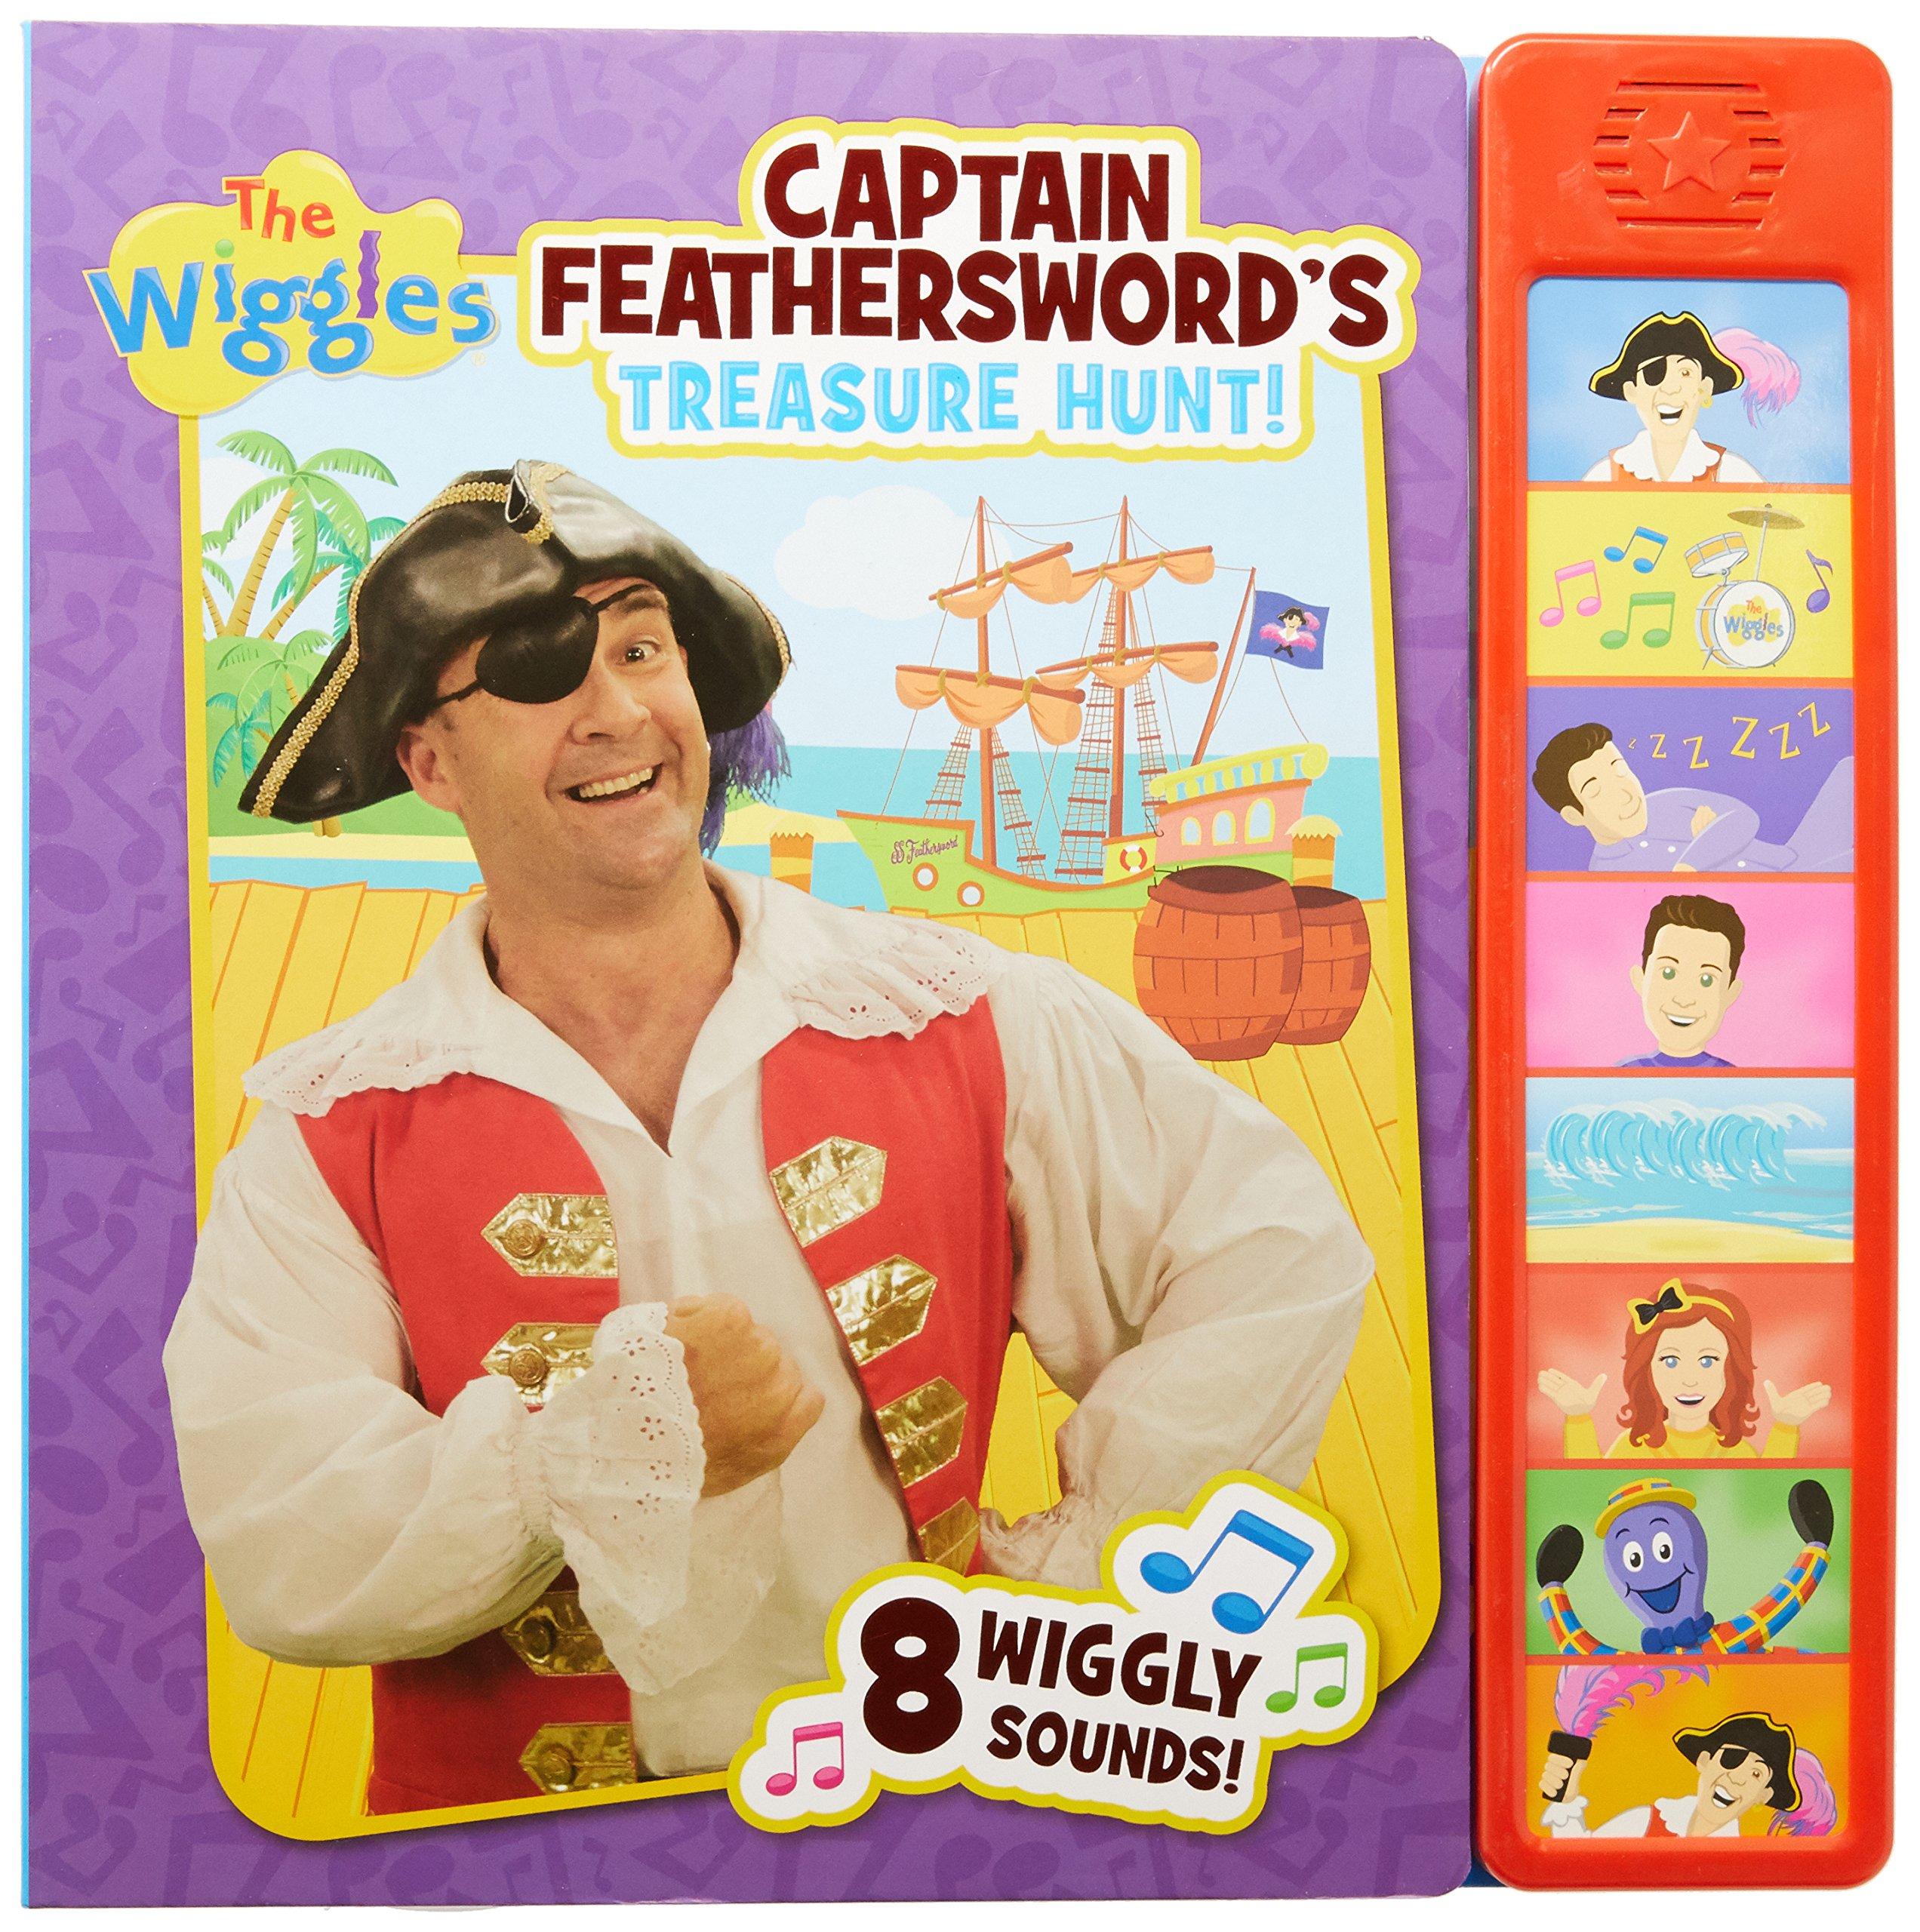 Captain Feathersword's Treasure Hunt!